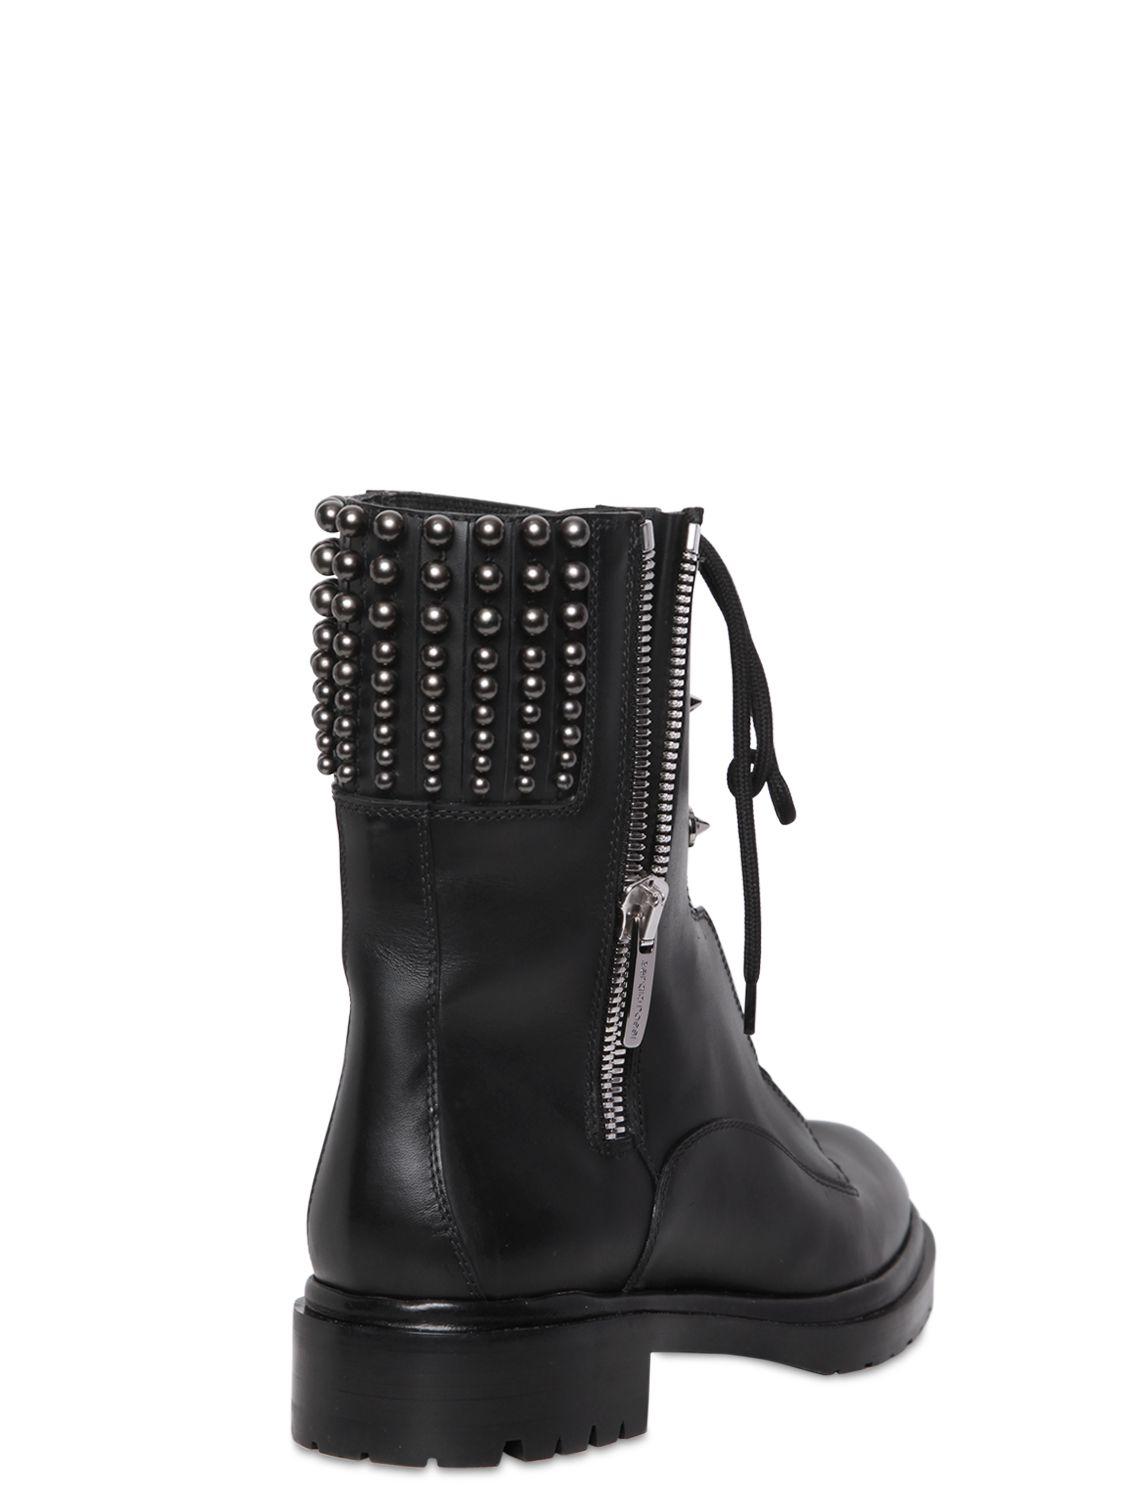 Sergio rossi 30Mm Rockstar Leather Combat Boots in Black ...